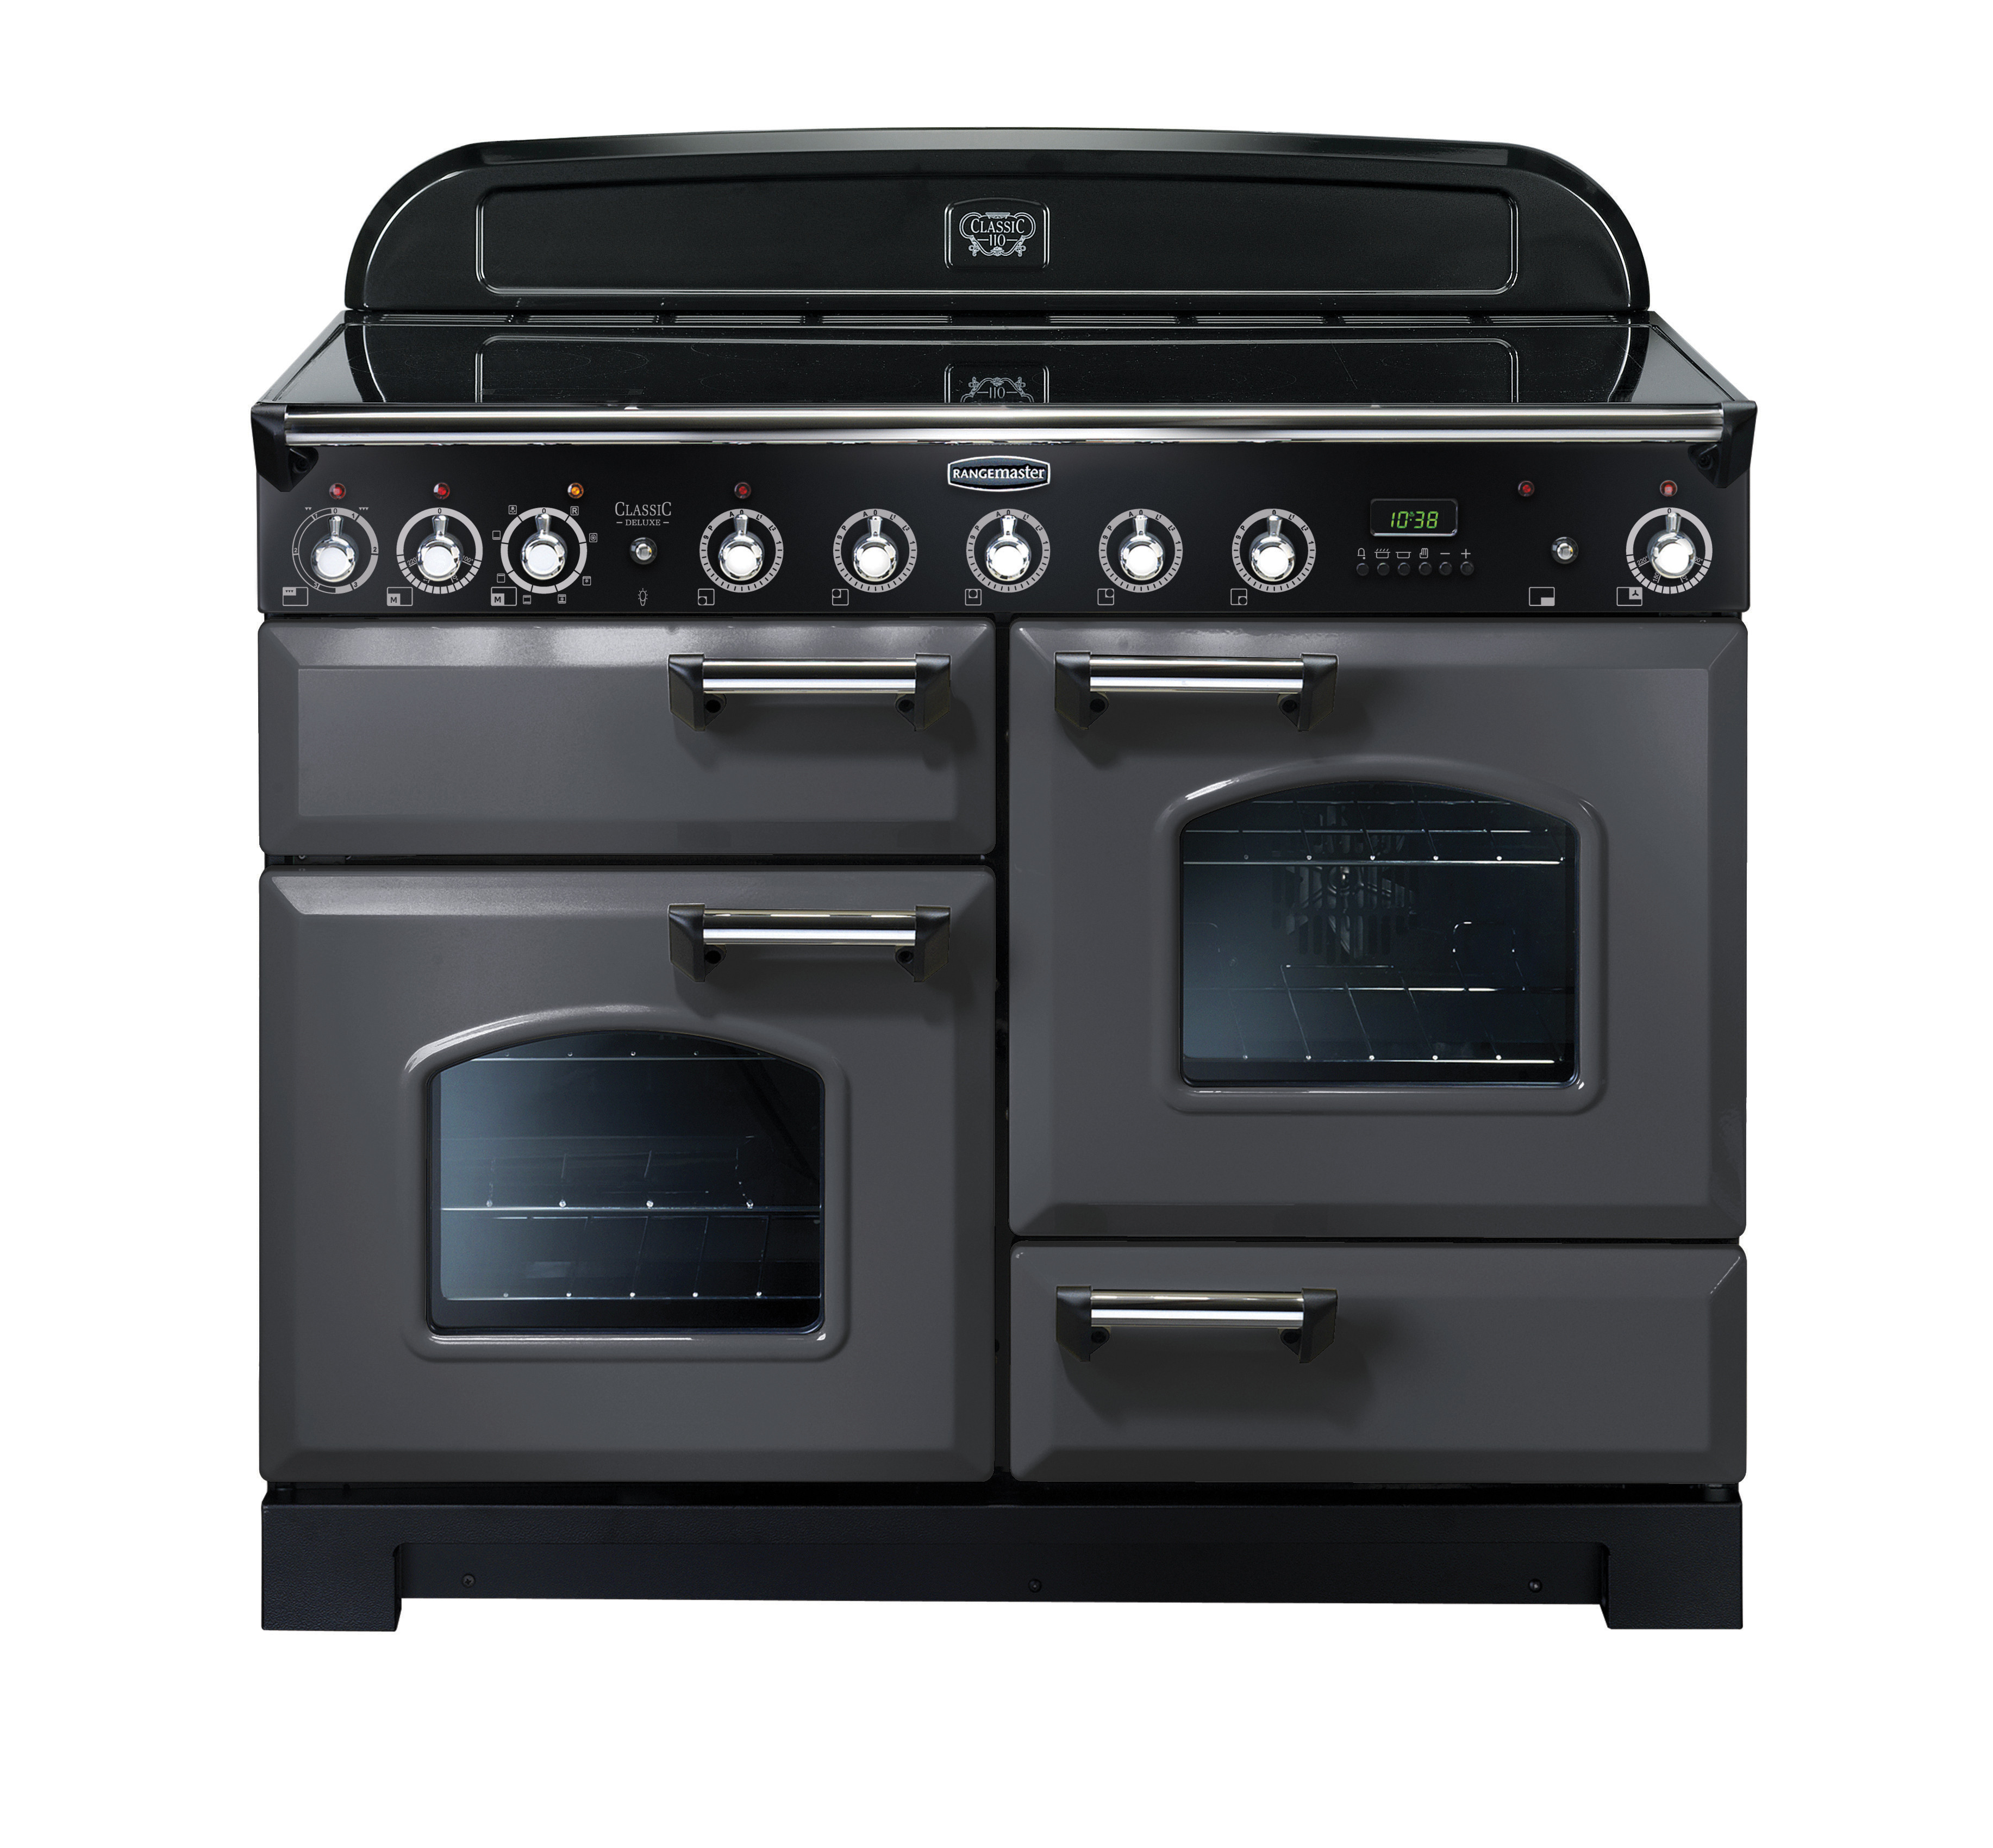 Rangemaster Classic Deluxe 110 Induction Range Cooker Slate/Chrome Trim CDL110EISL/C 123410